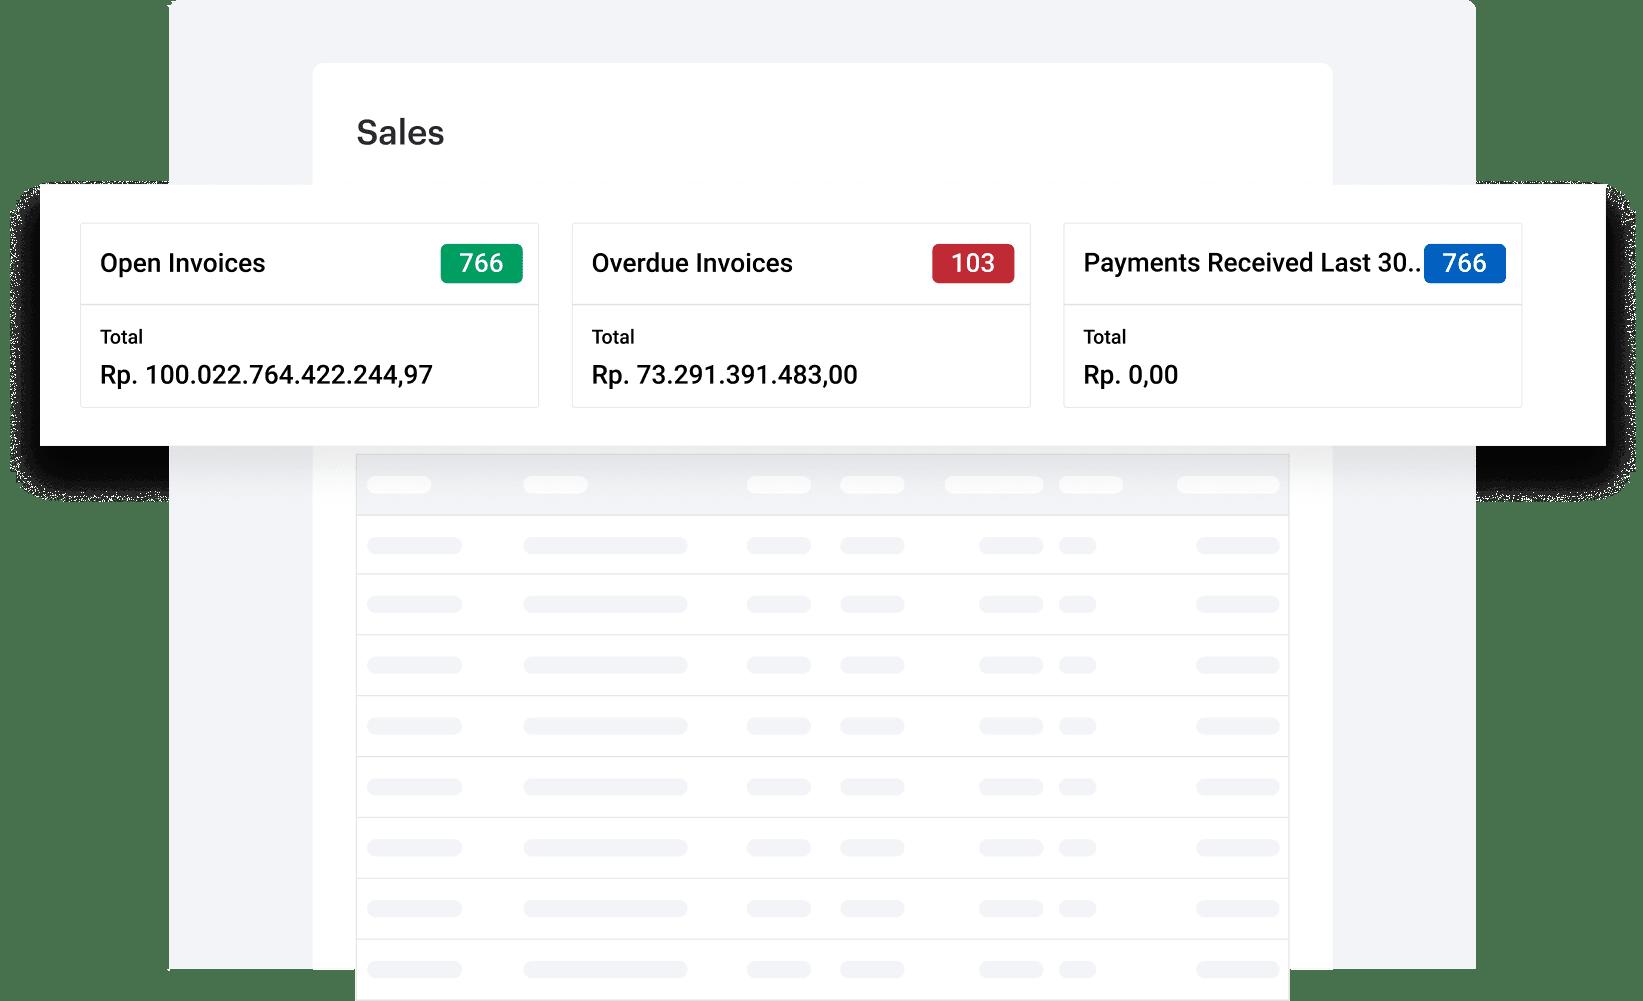 Categorization of transactions